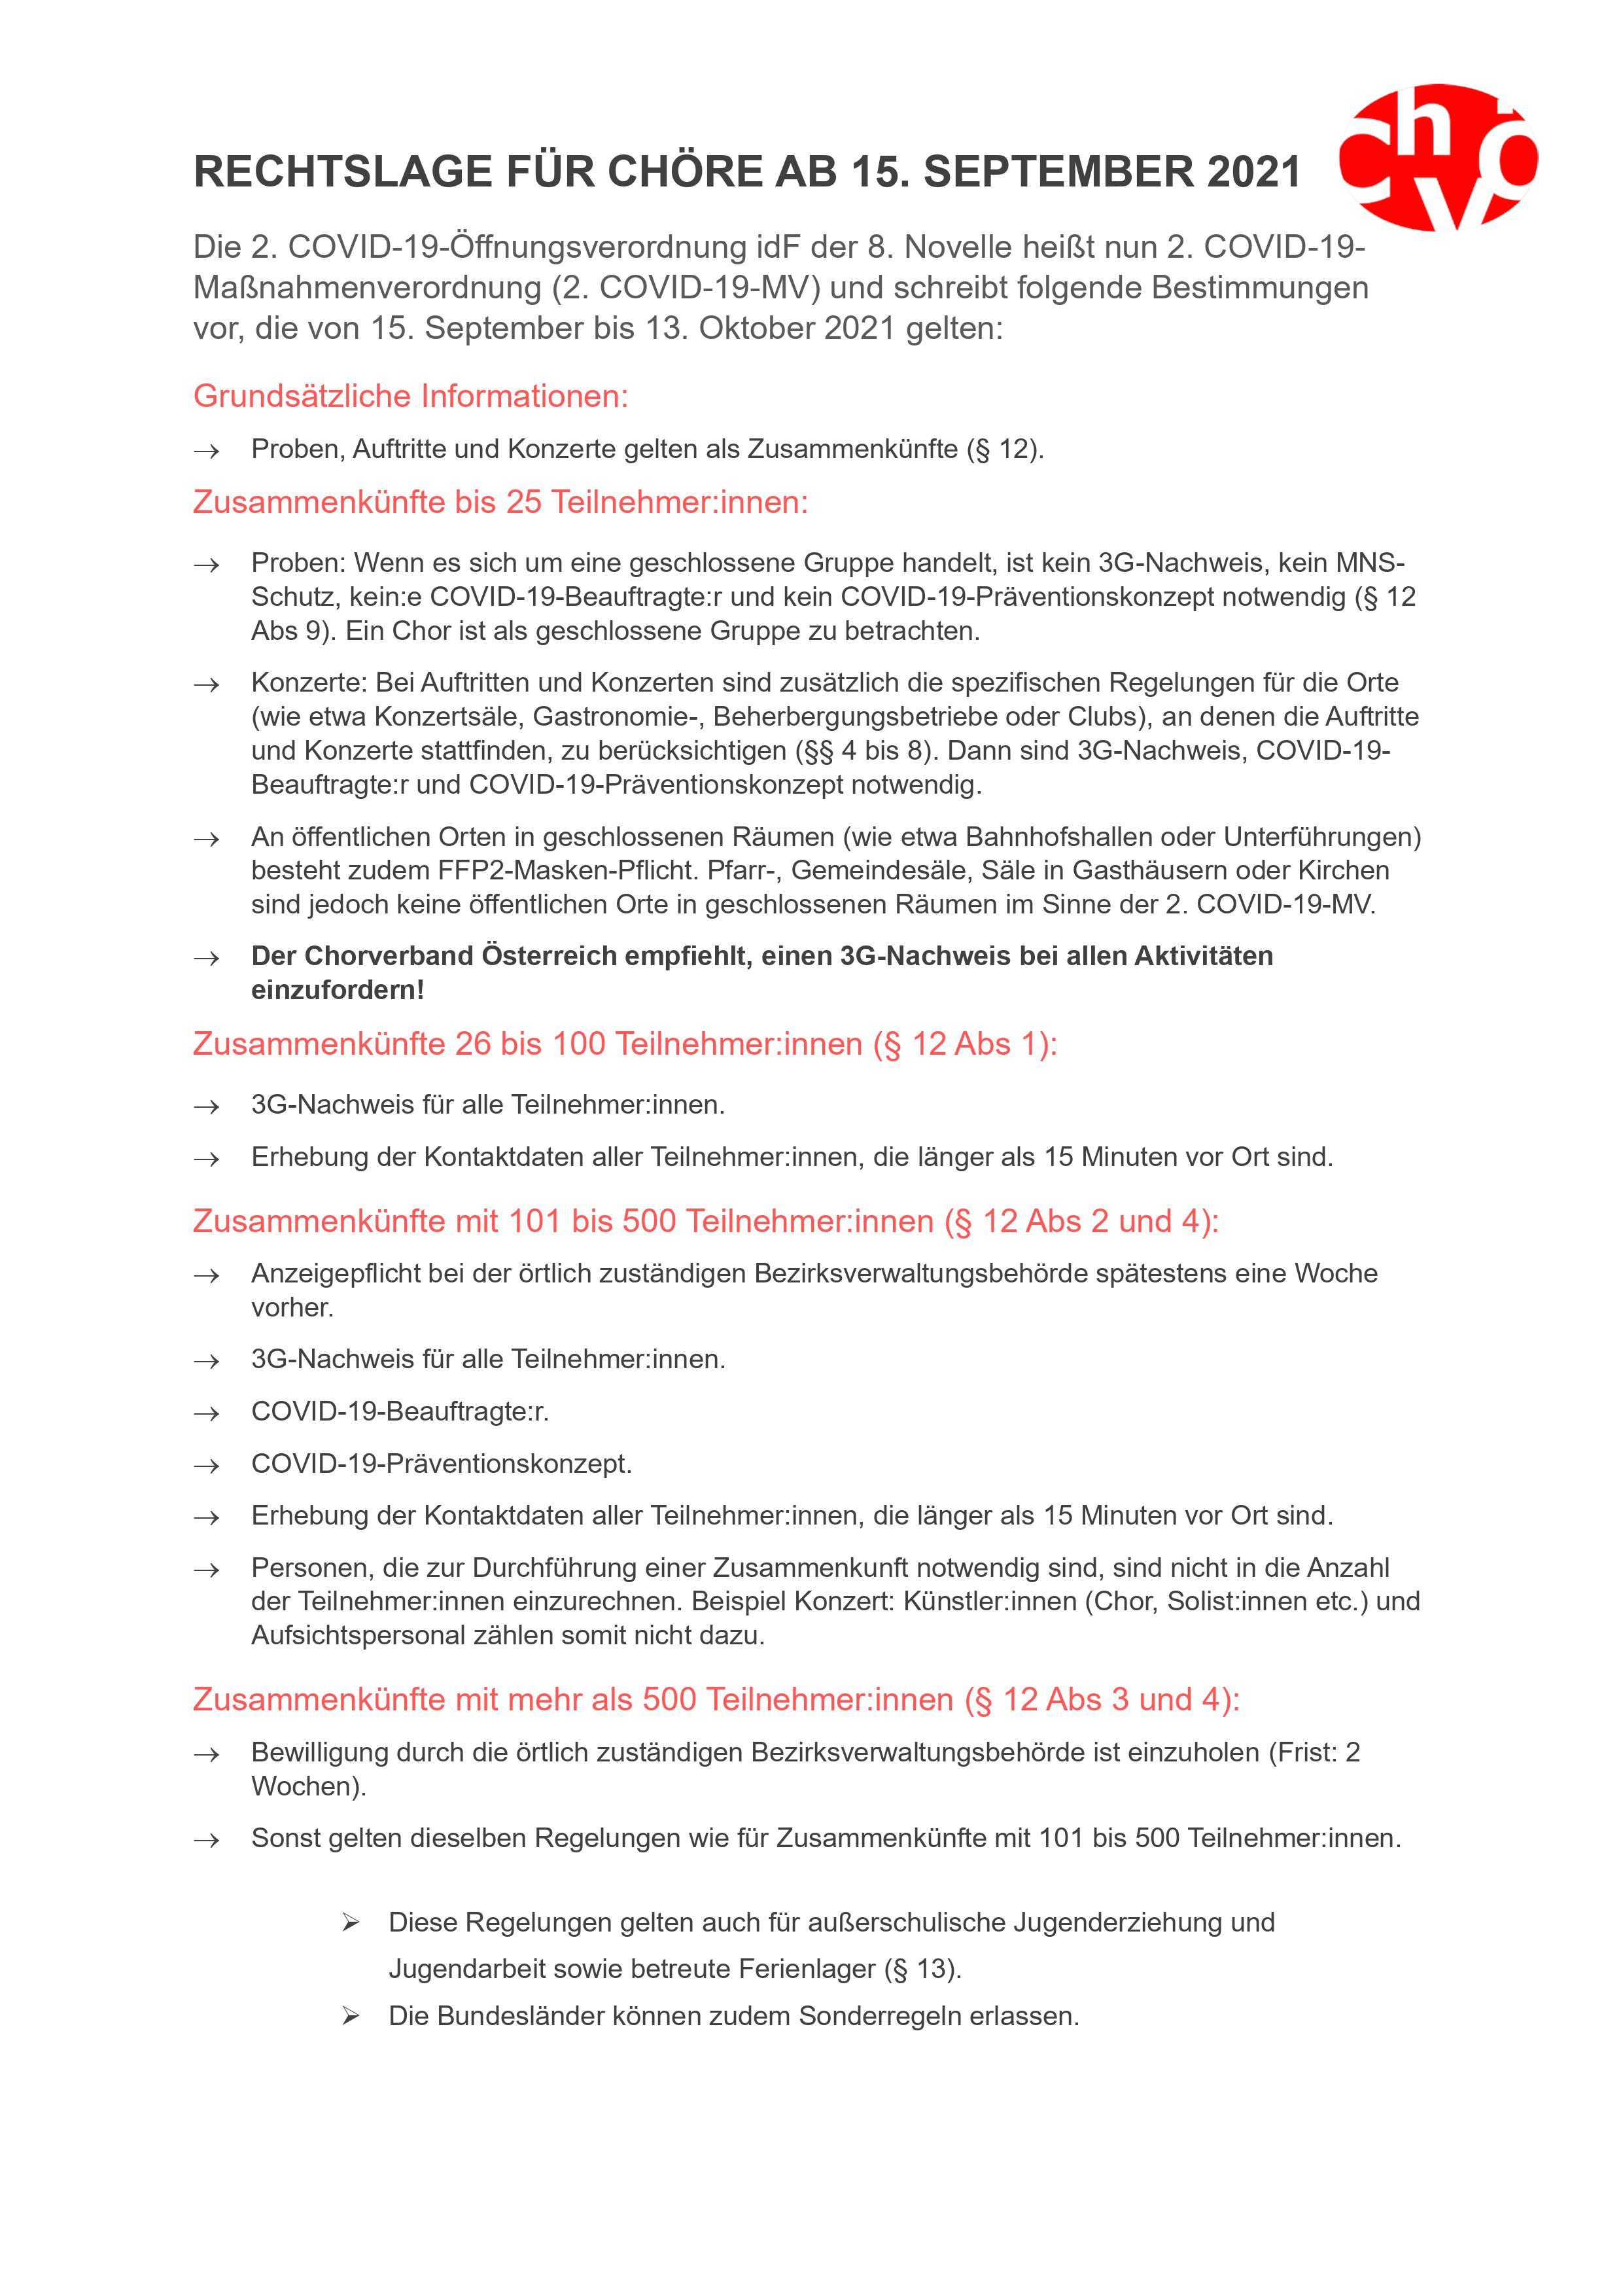 Rechtslage Choere 15092021